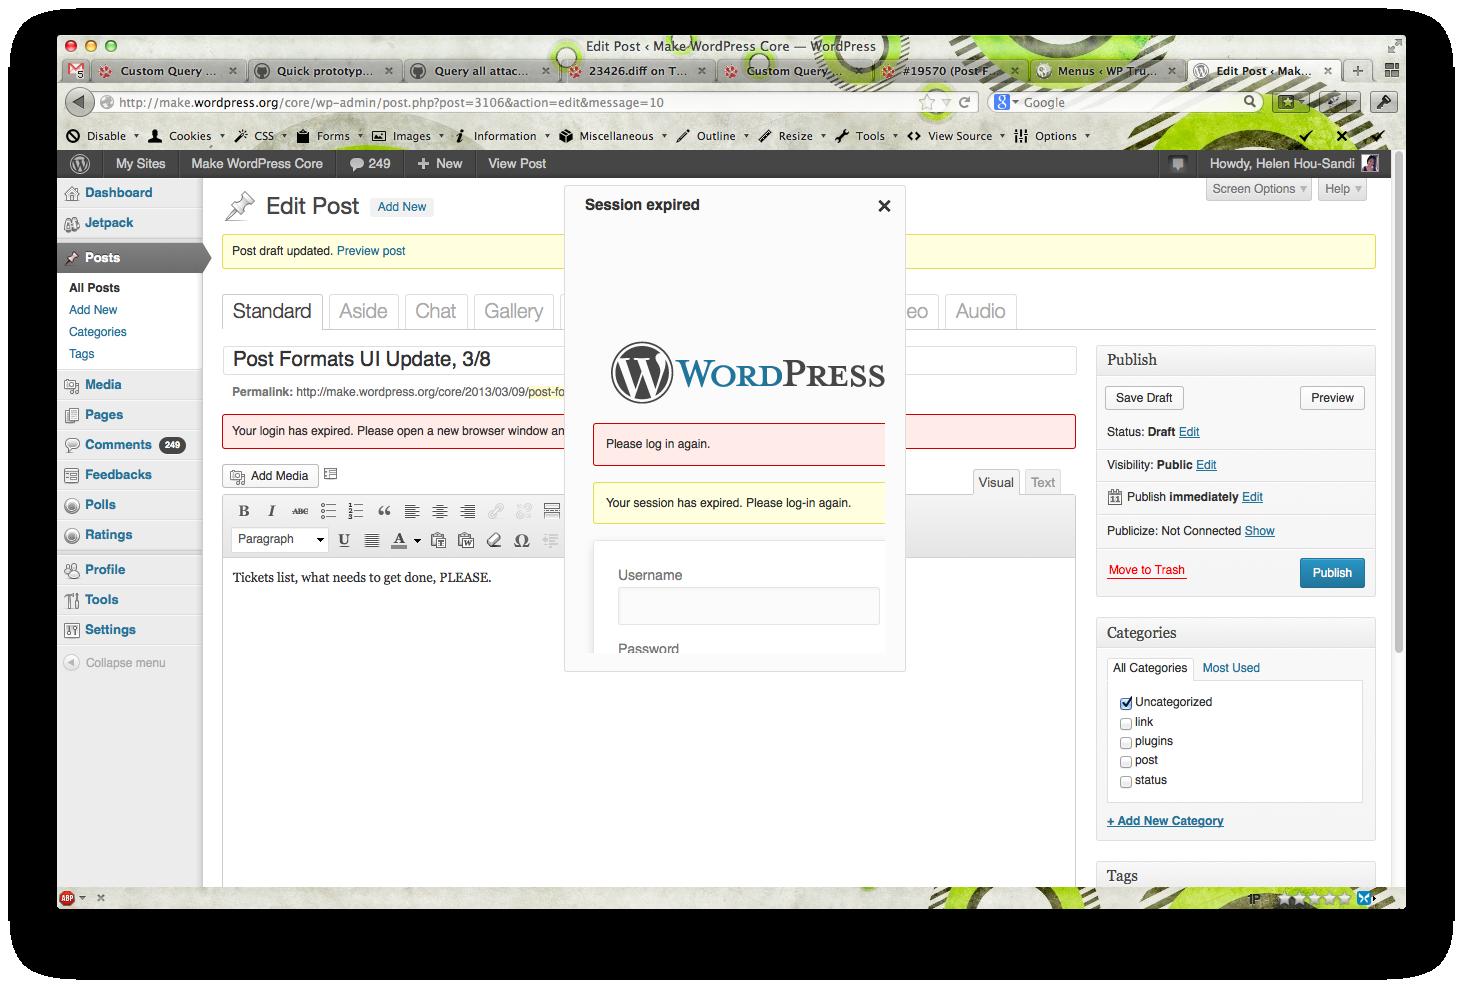 23295 (Improved login expiration warning) – WordPress Trac